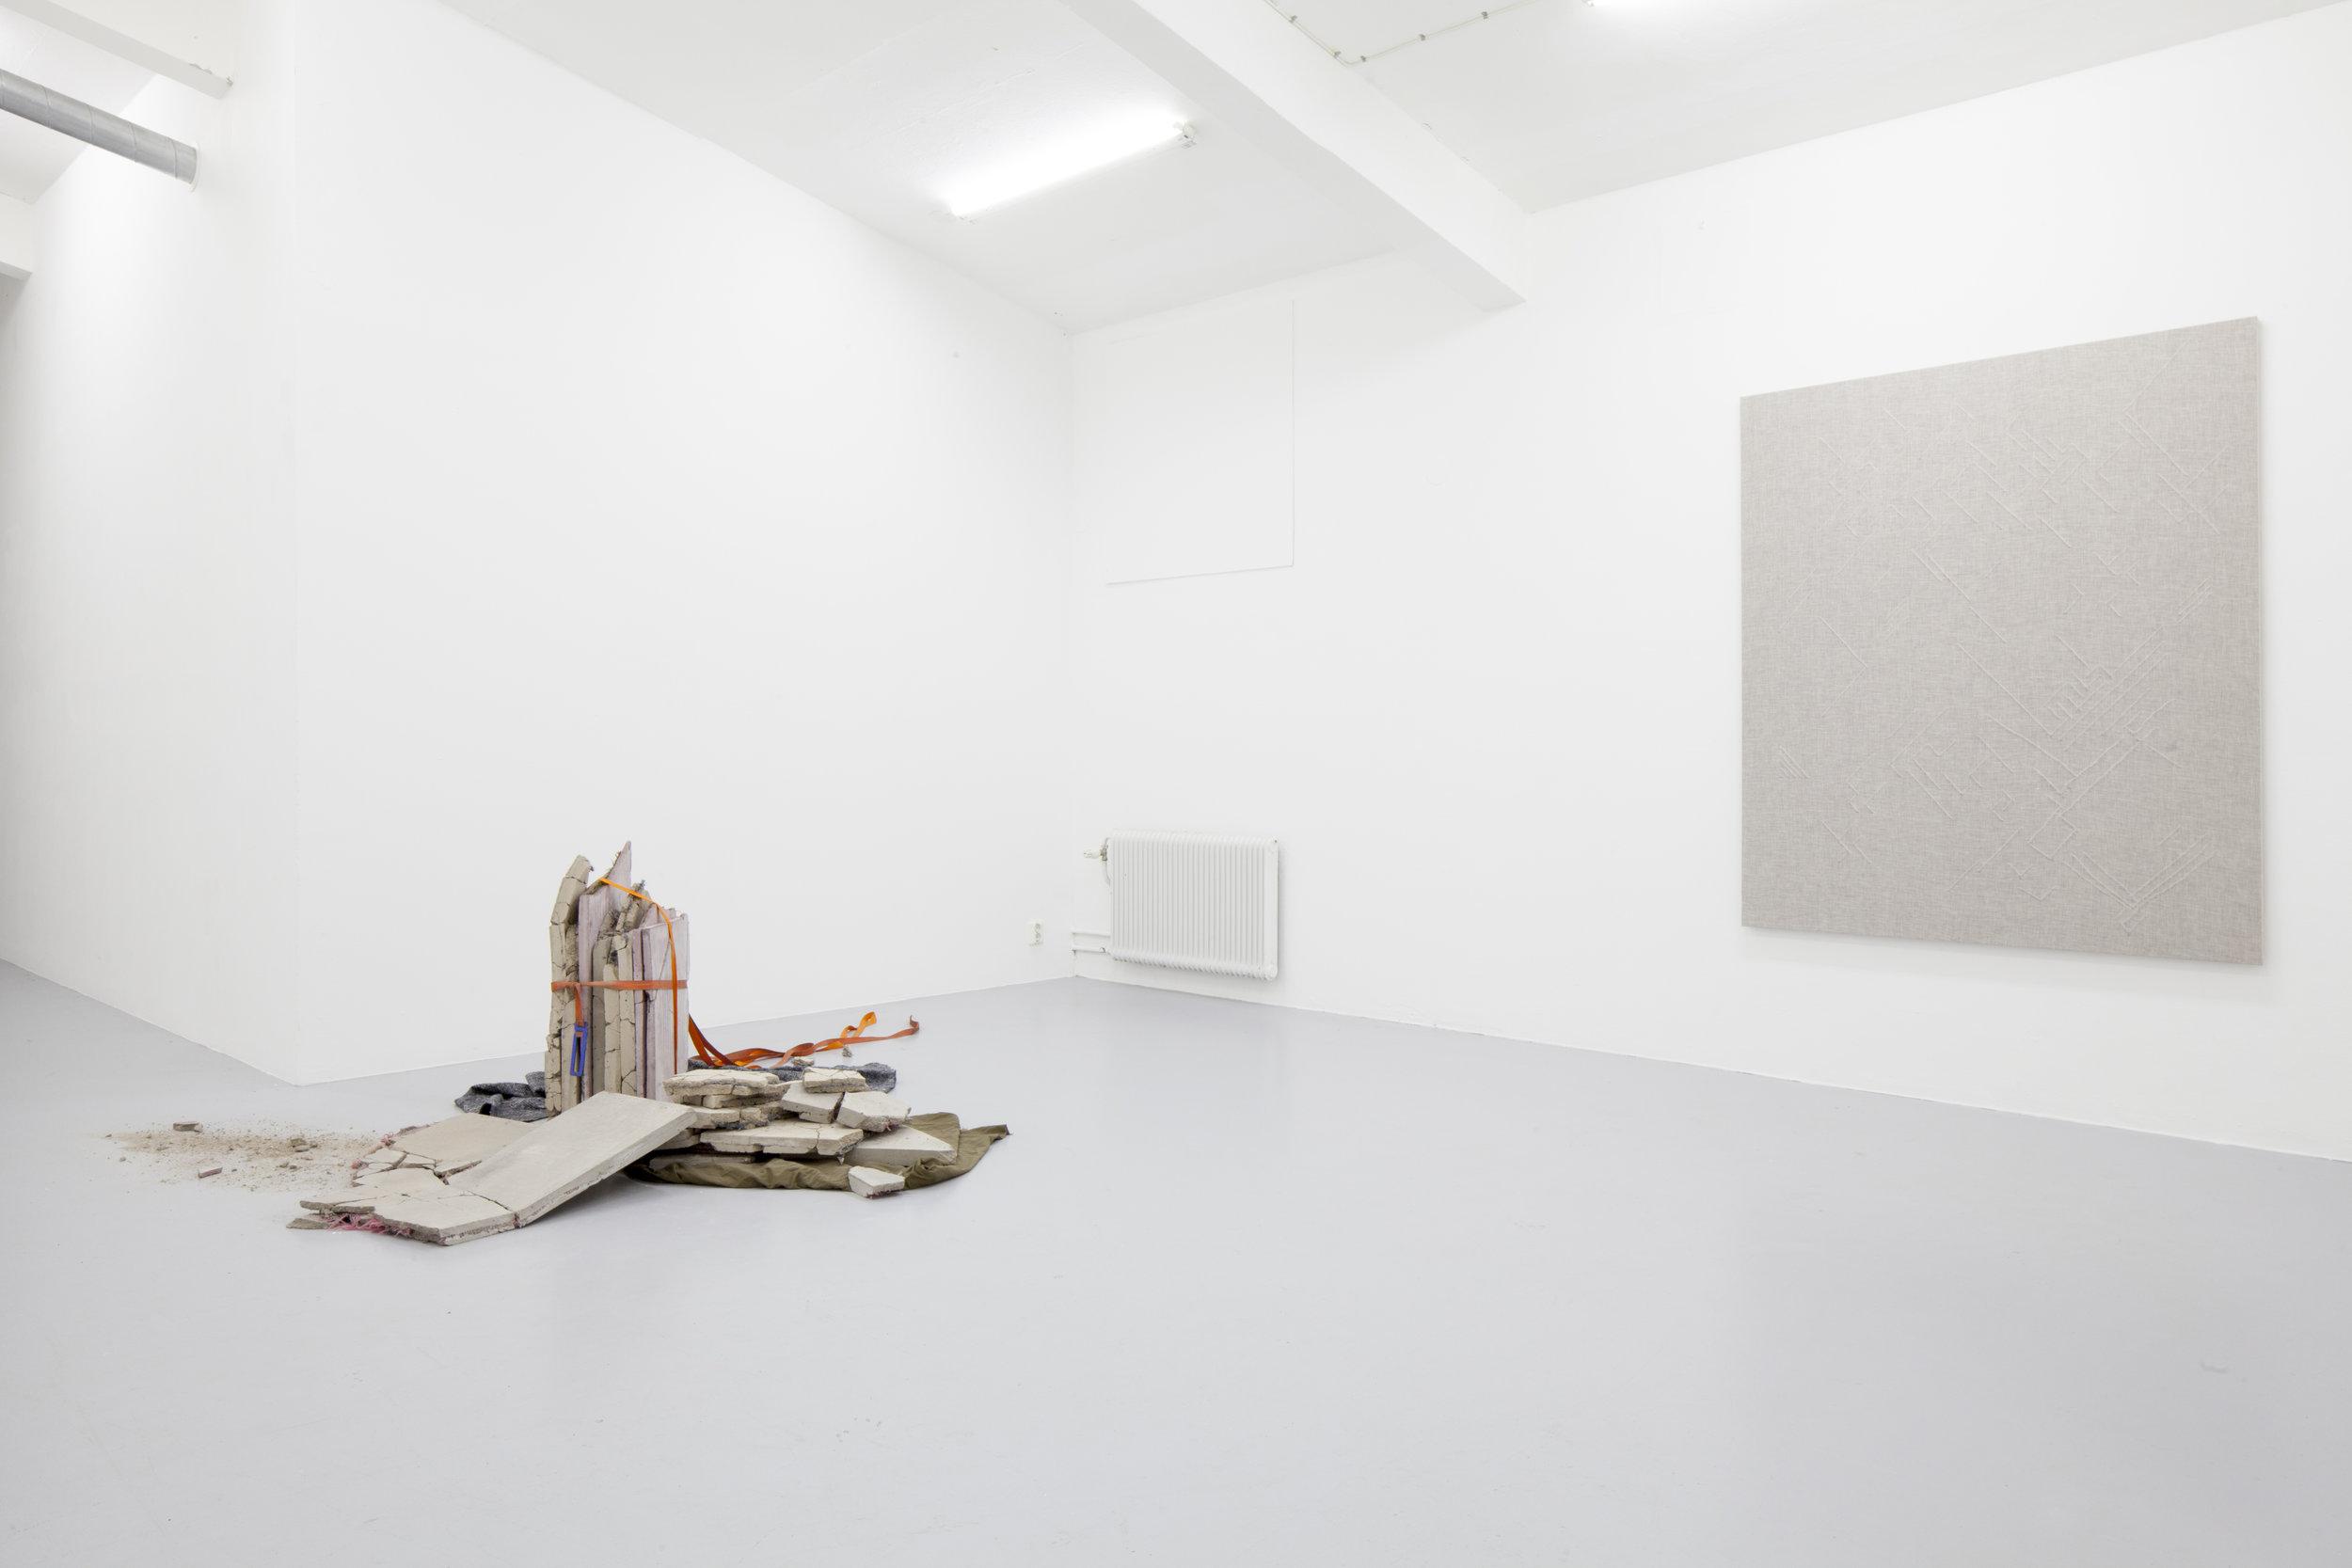 Installation view, Pareidolia, KHM Gallery